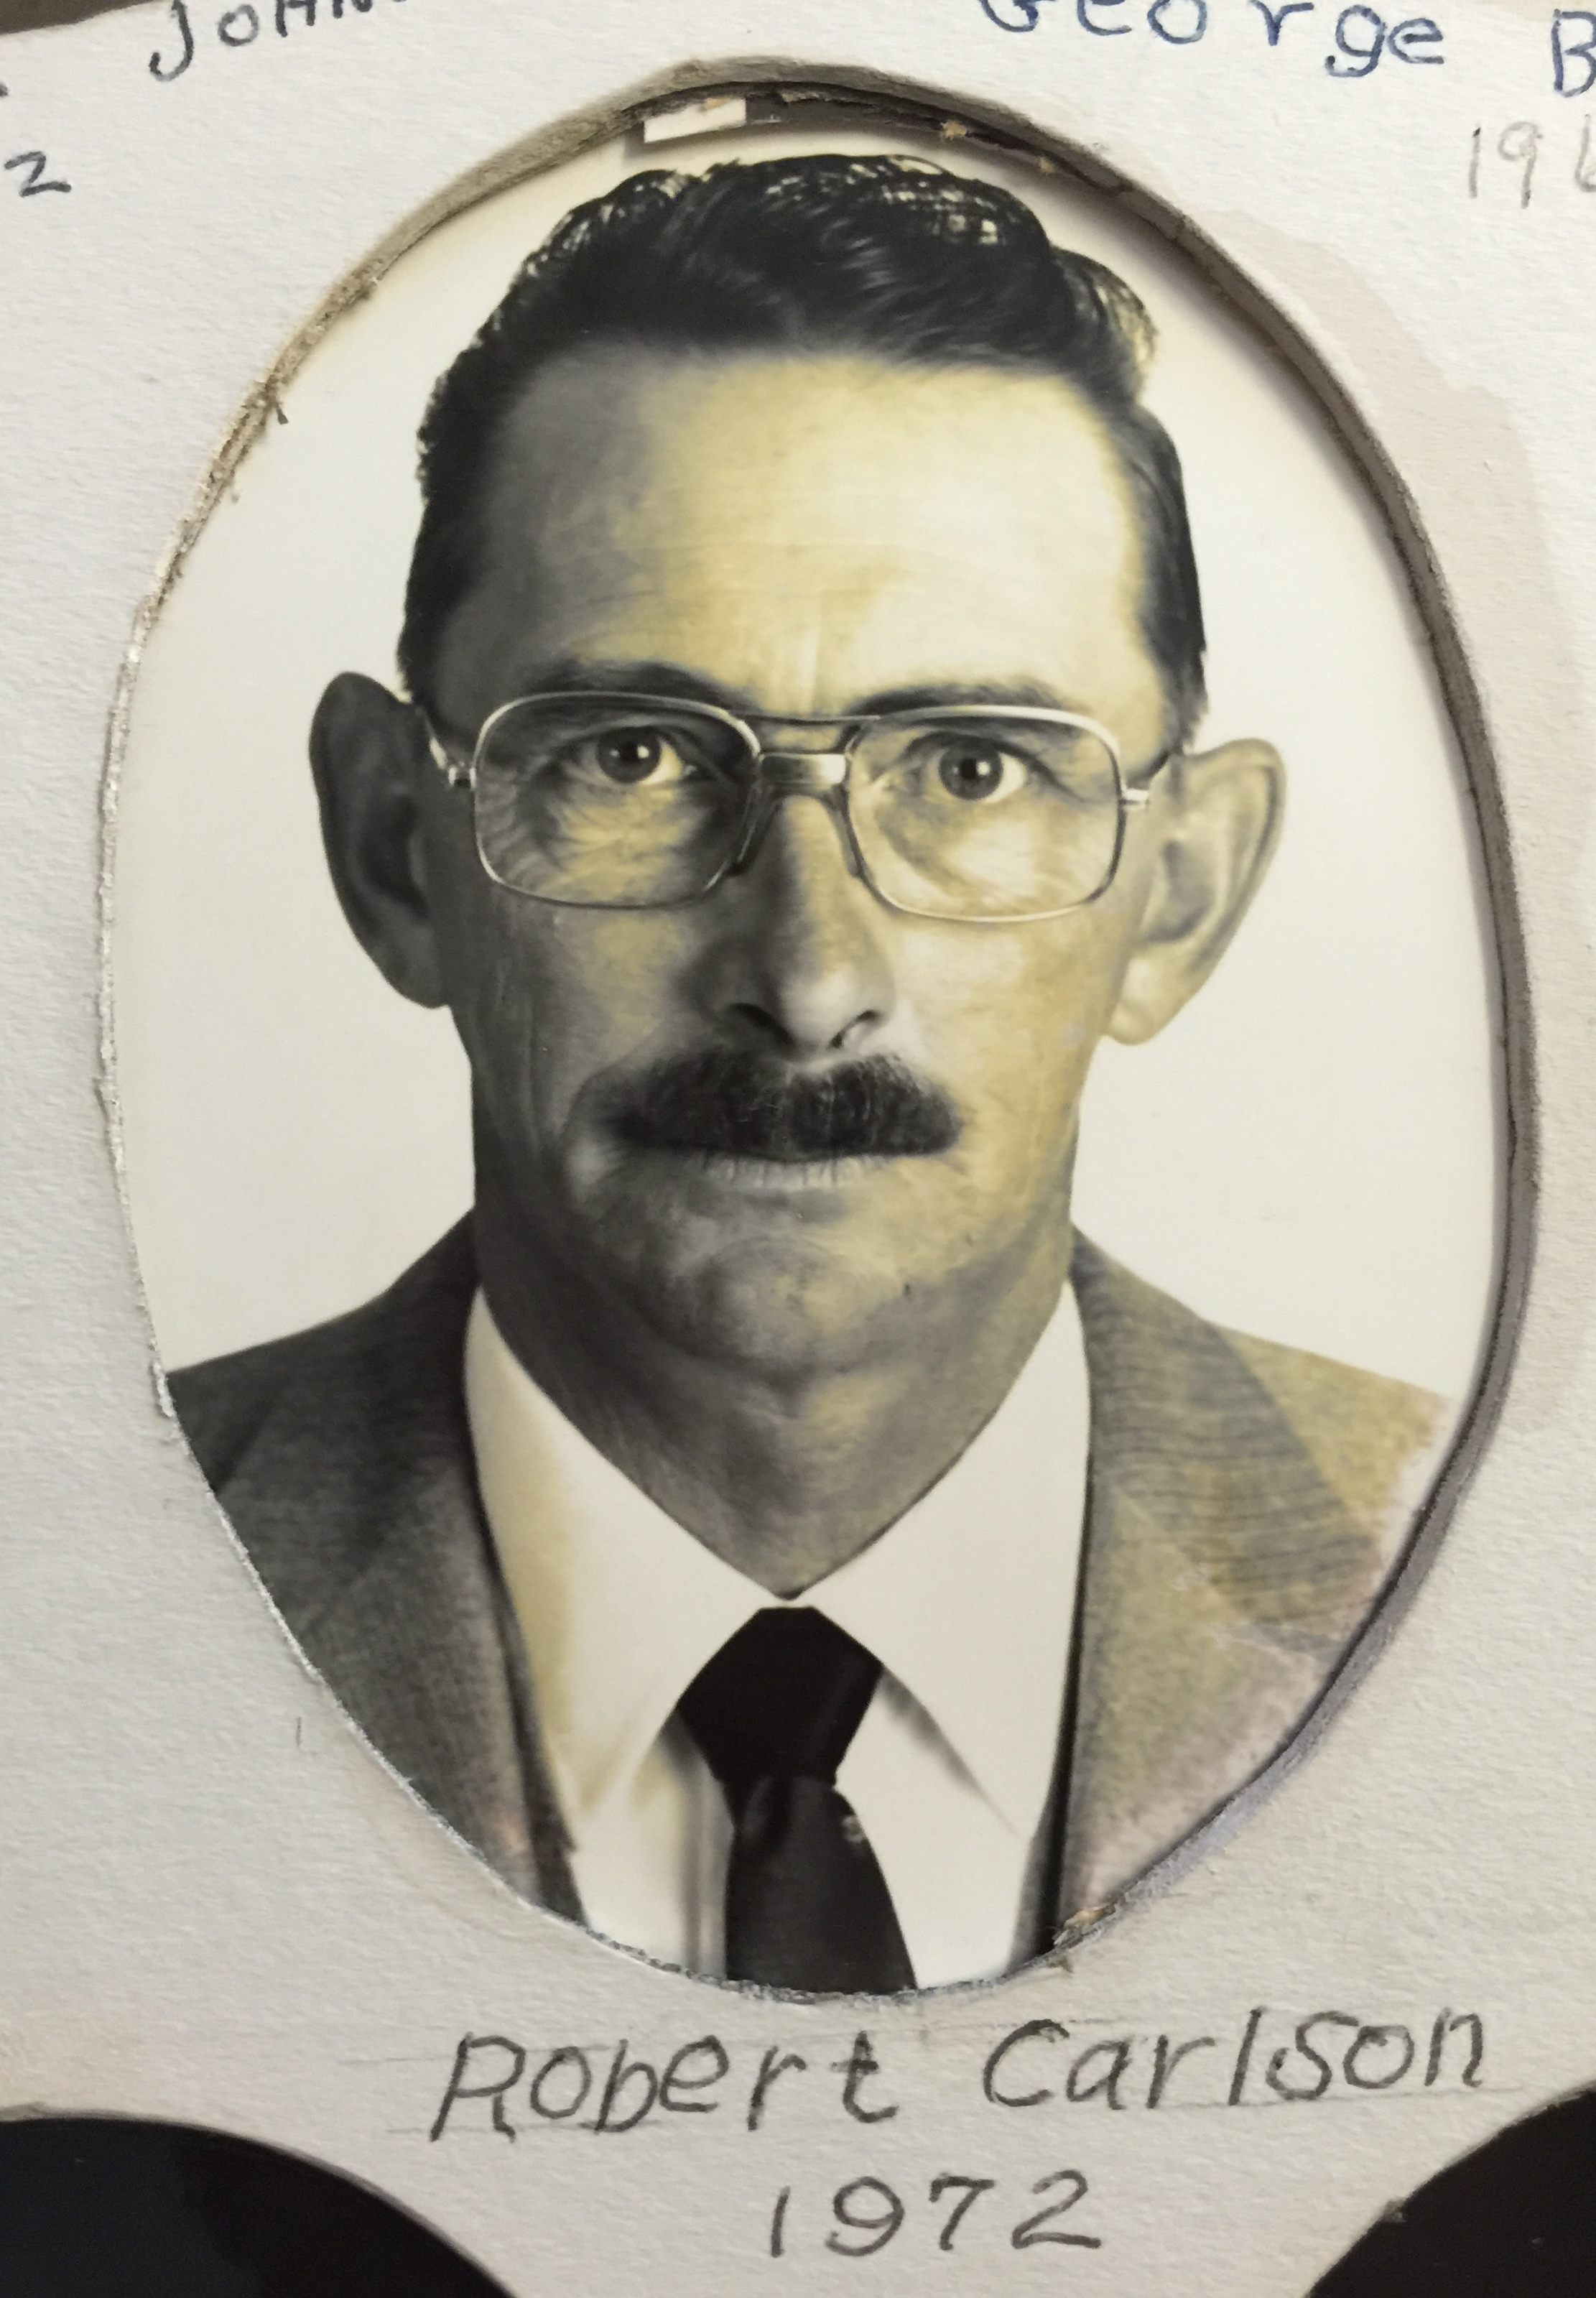 1972 Robert Carlson